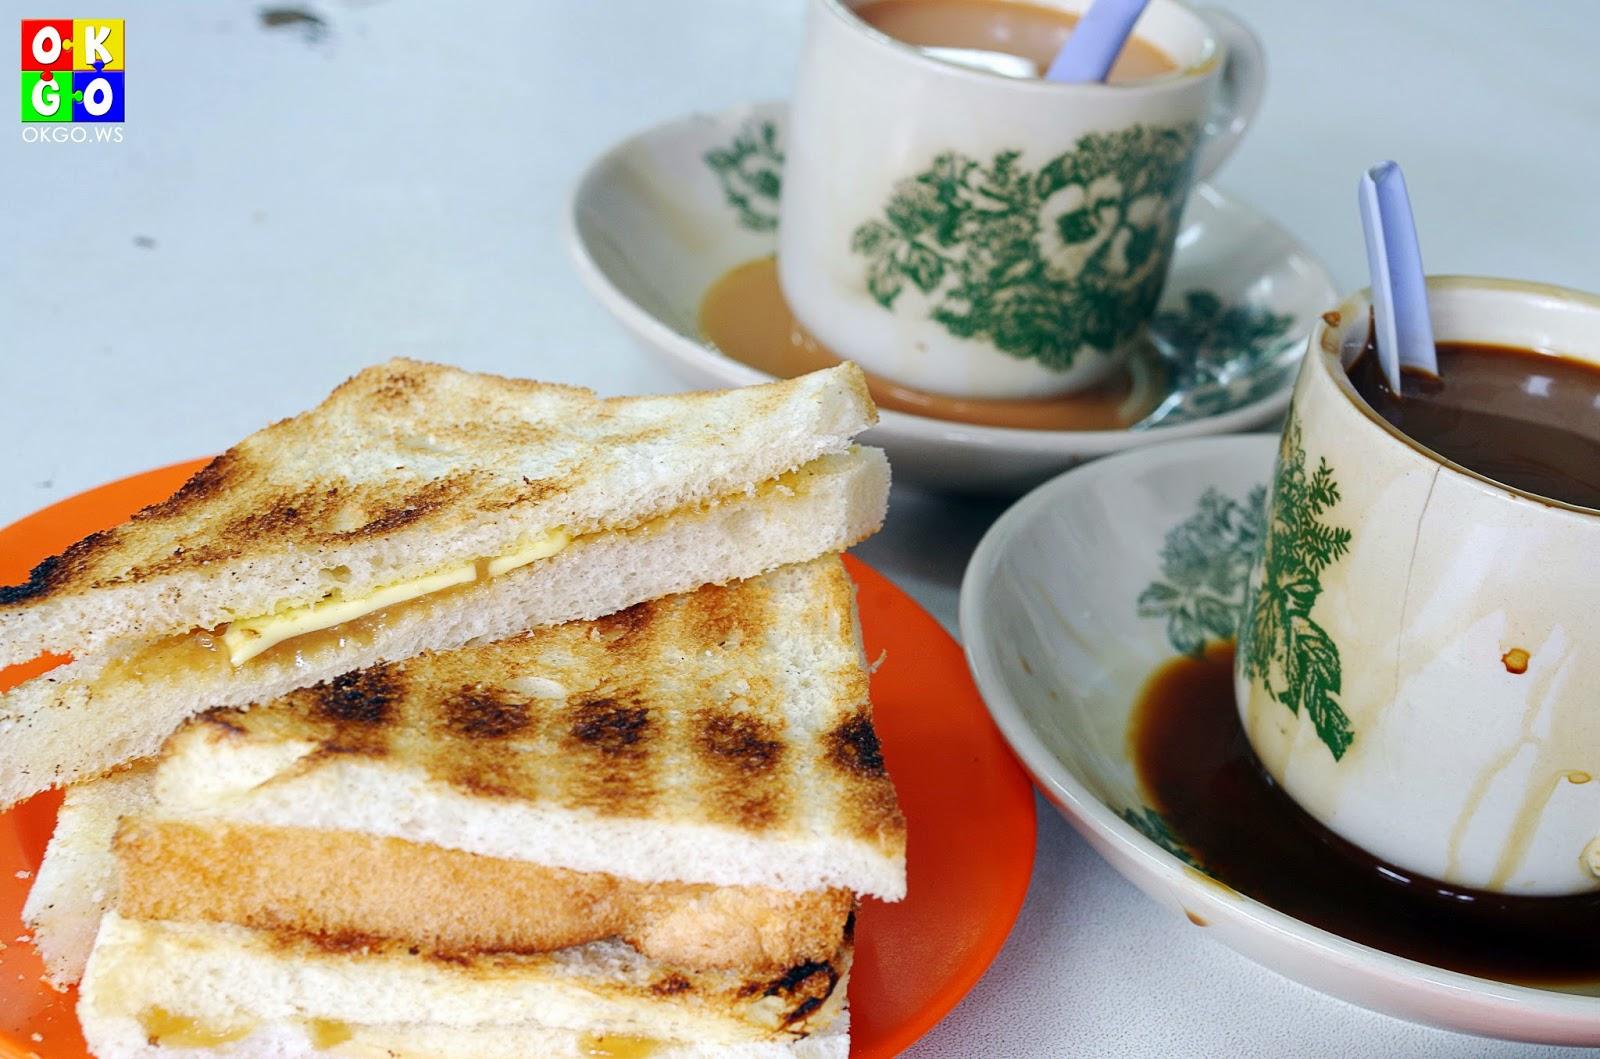 Jalan Tan Hiok Nee Kin Wah breakfast